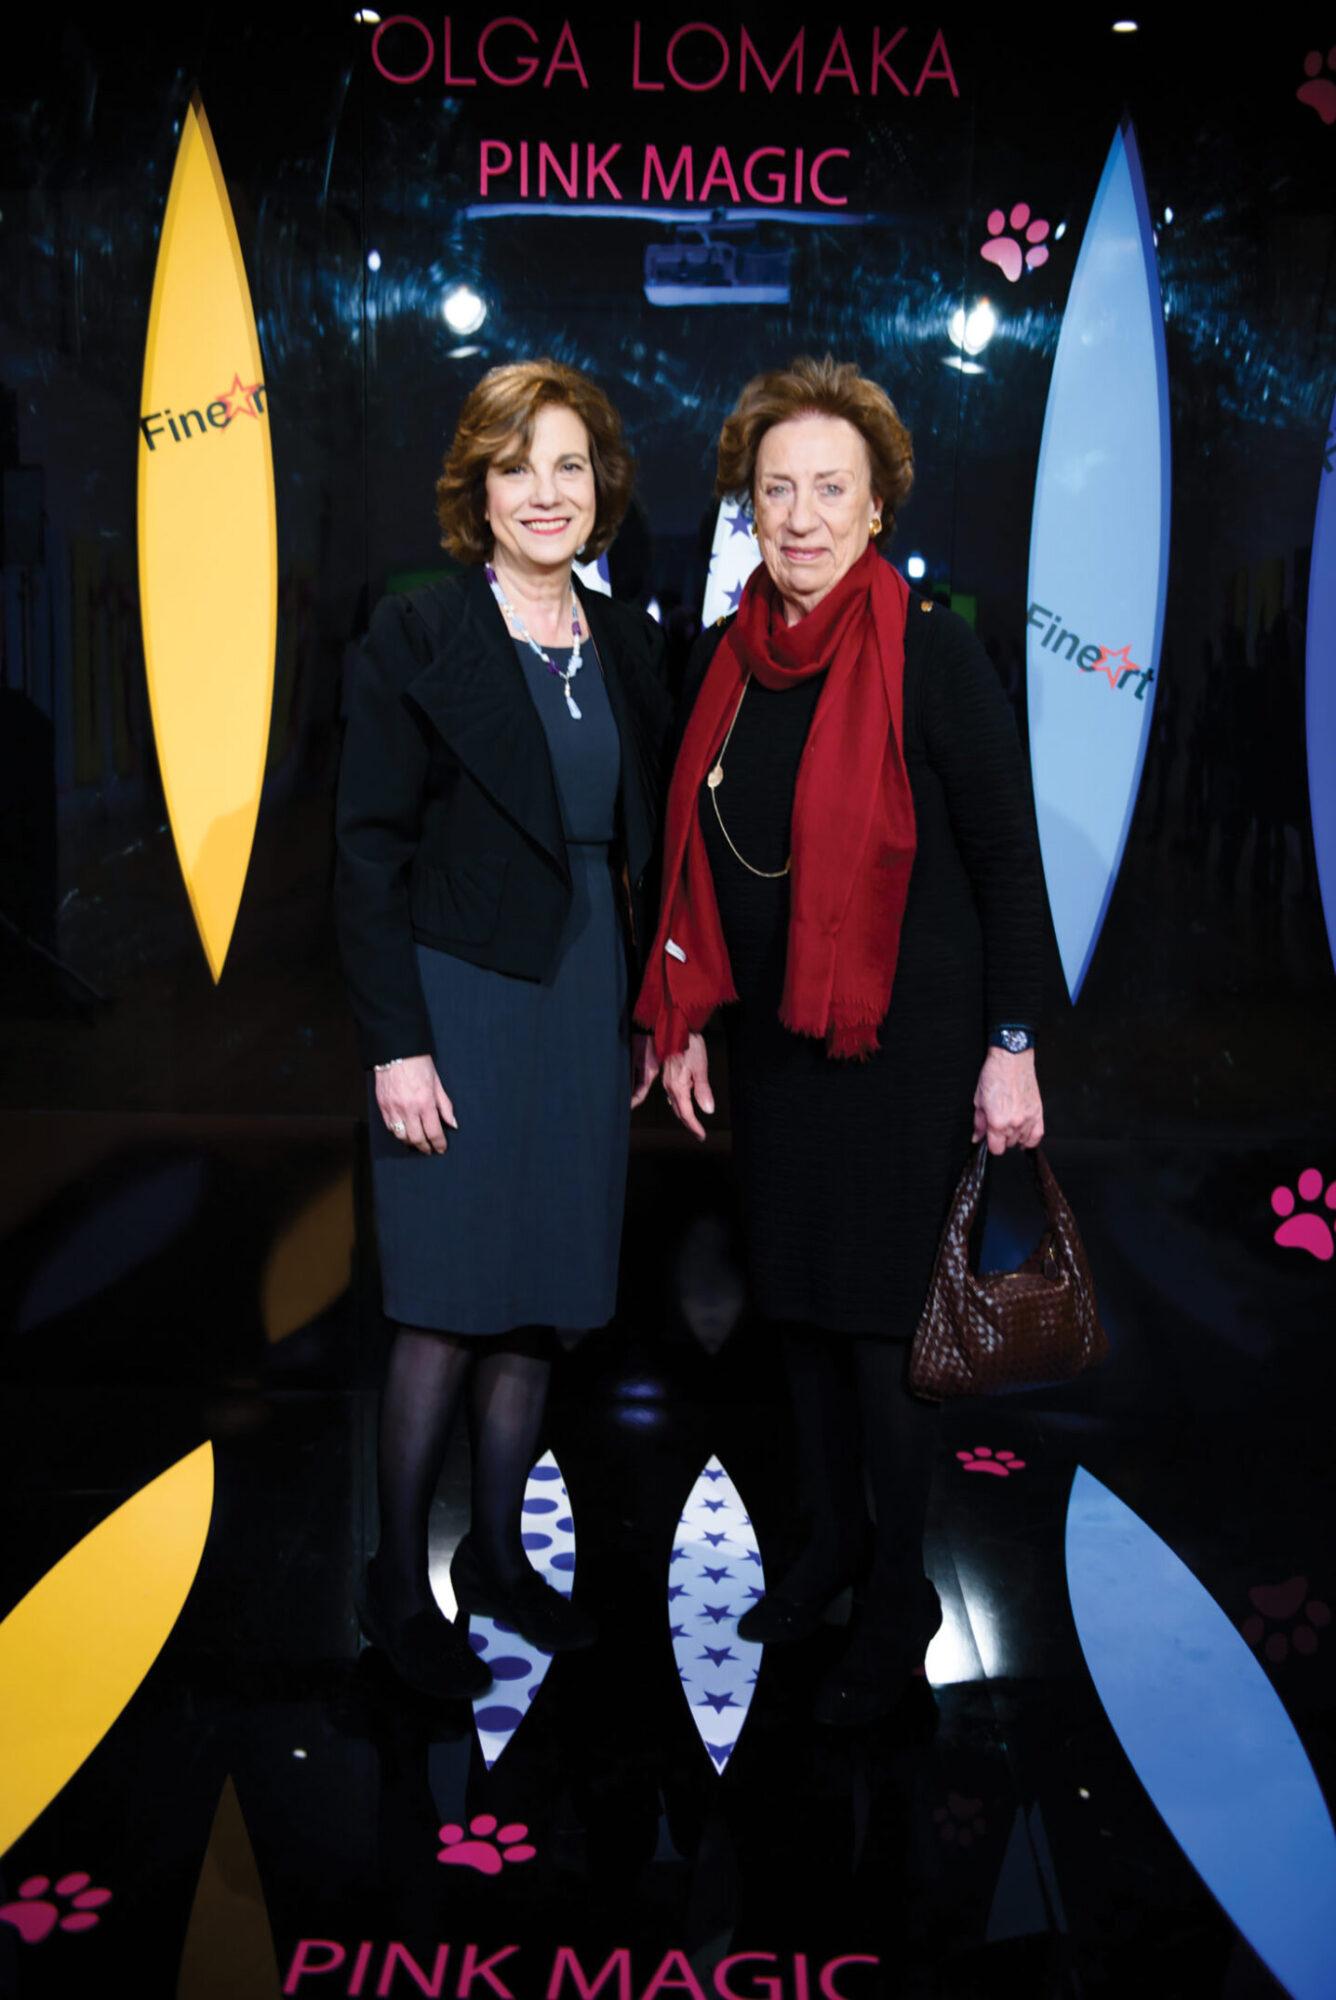 Agatha Kalisperas and Sophie Kydoniefs